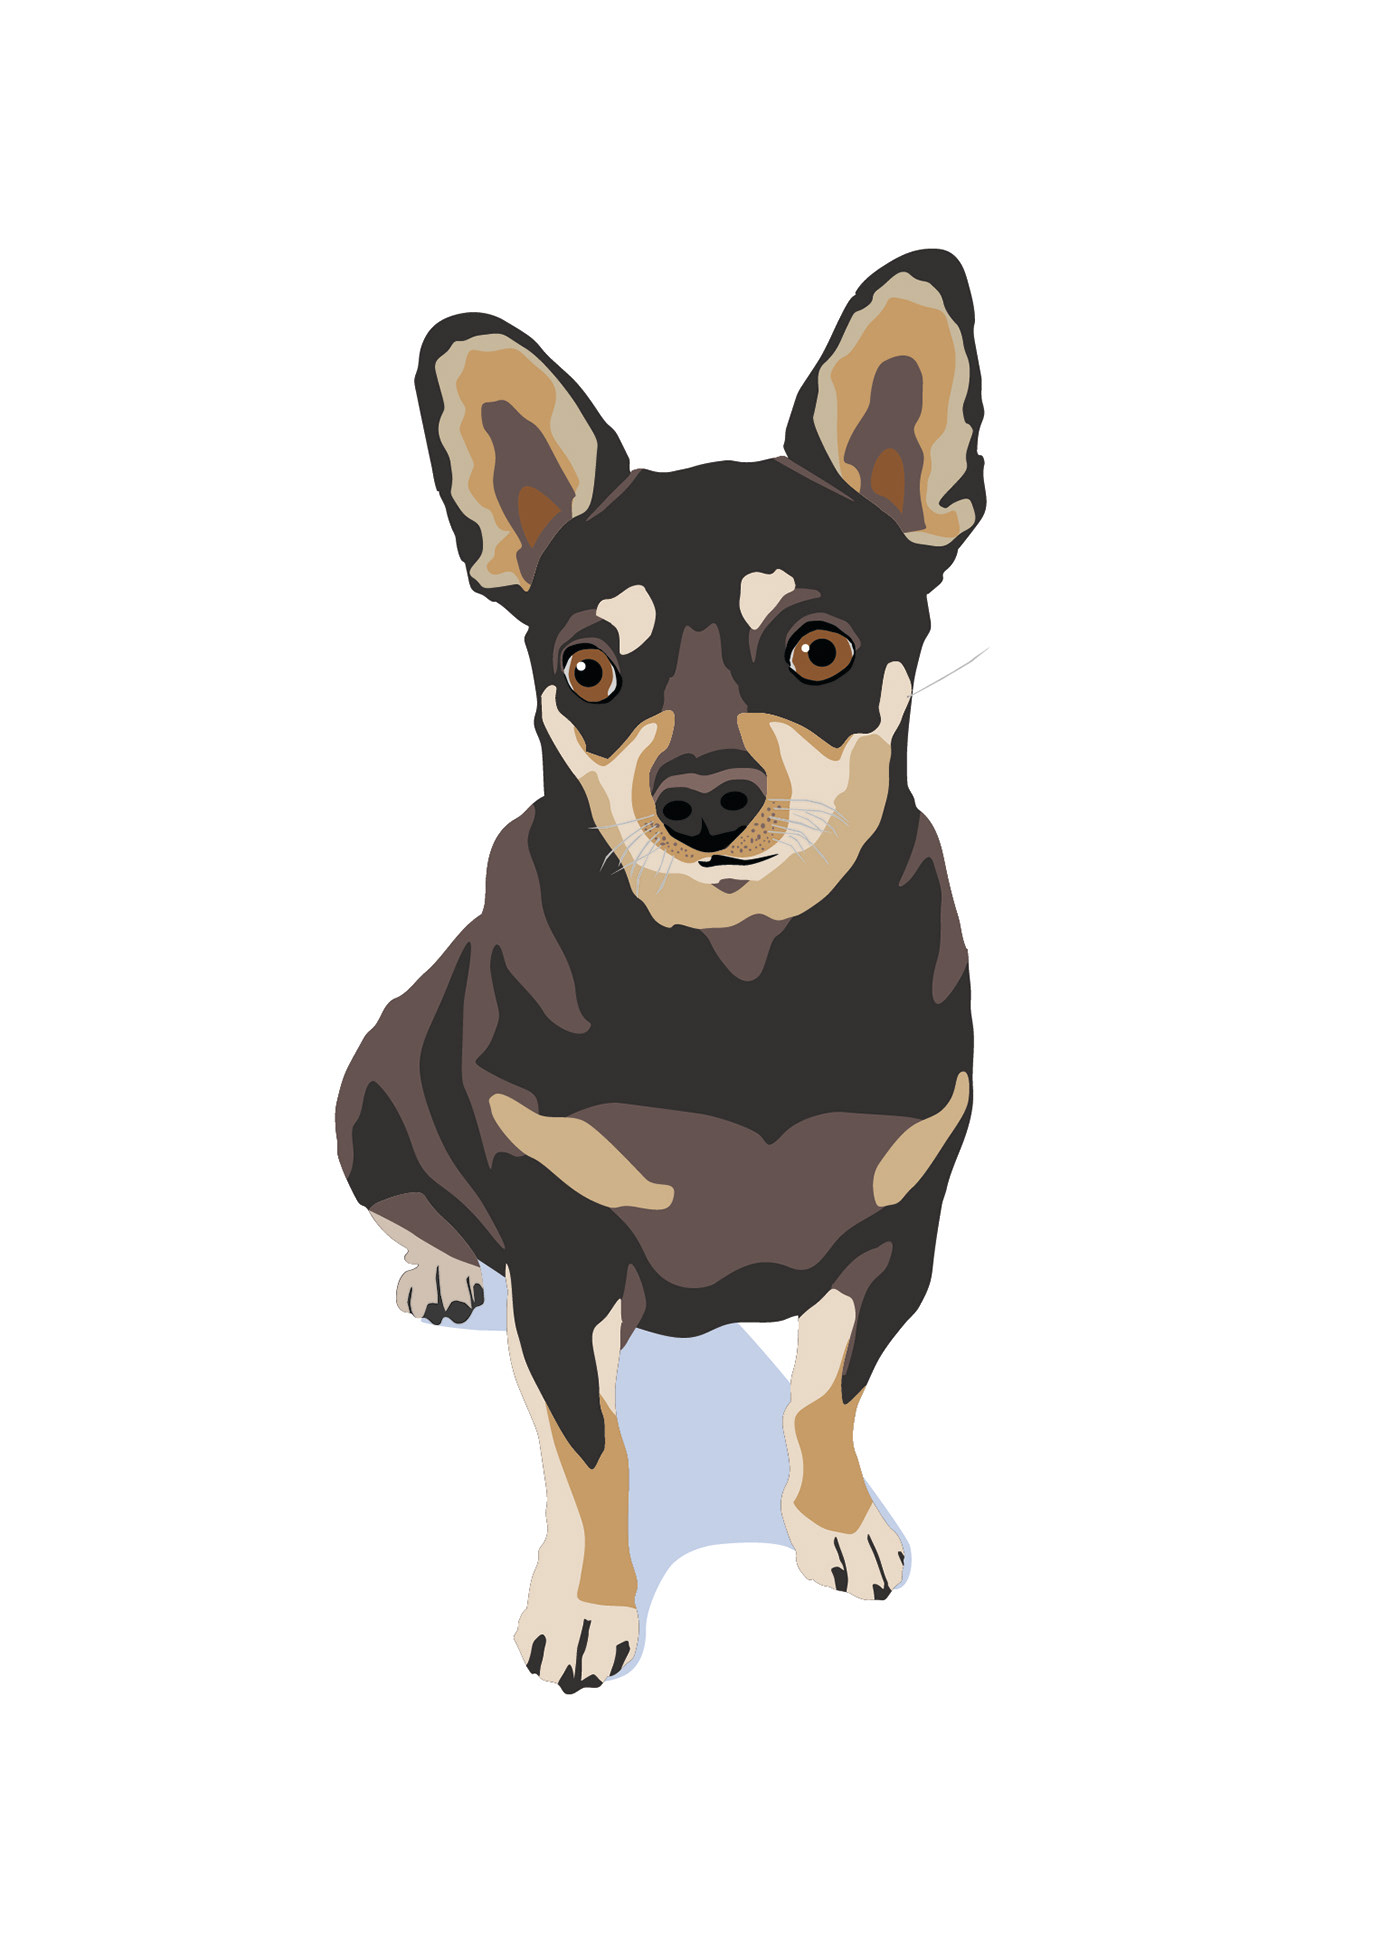 Image may contain: dog, animal and cartoon